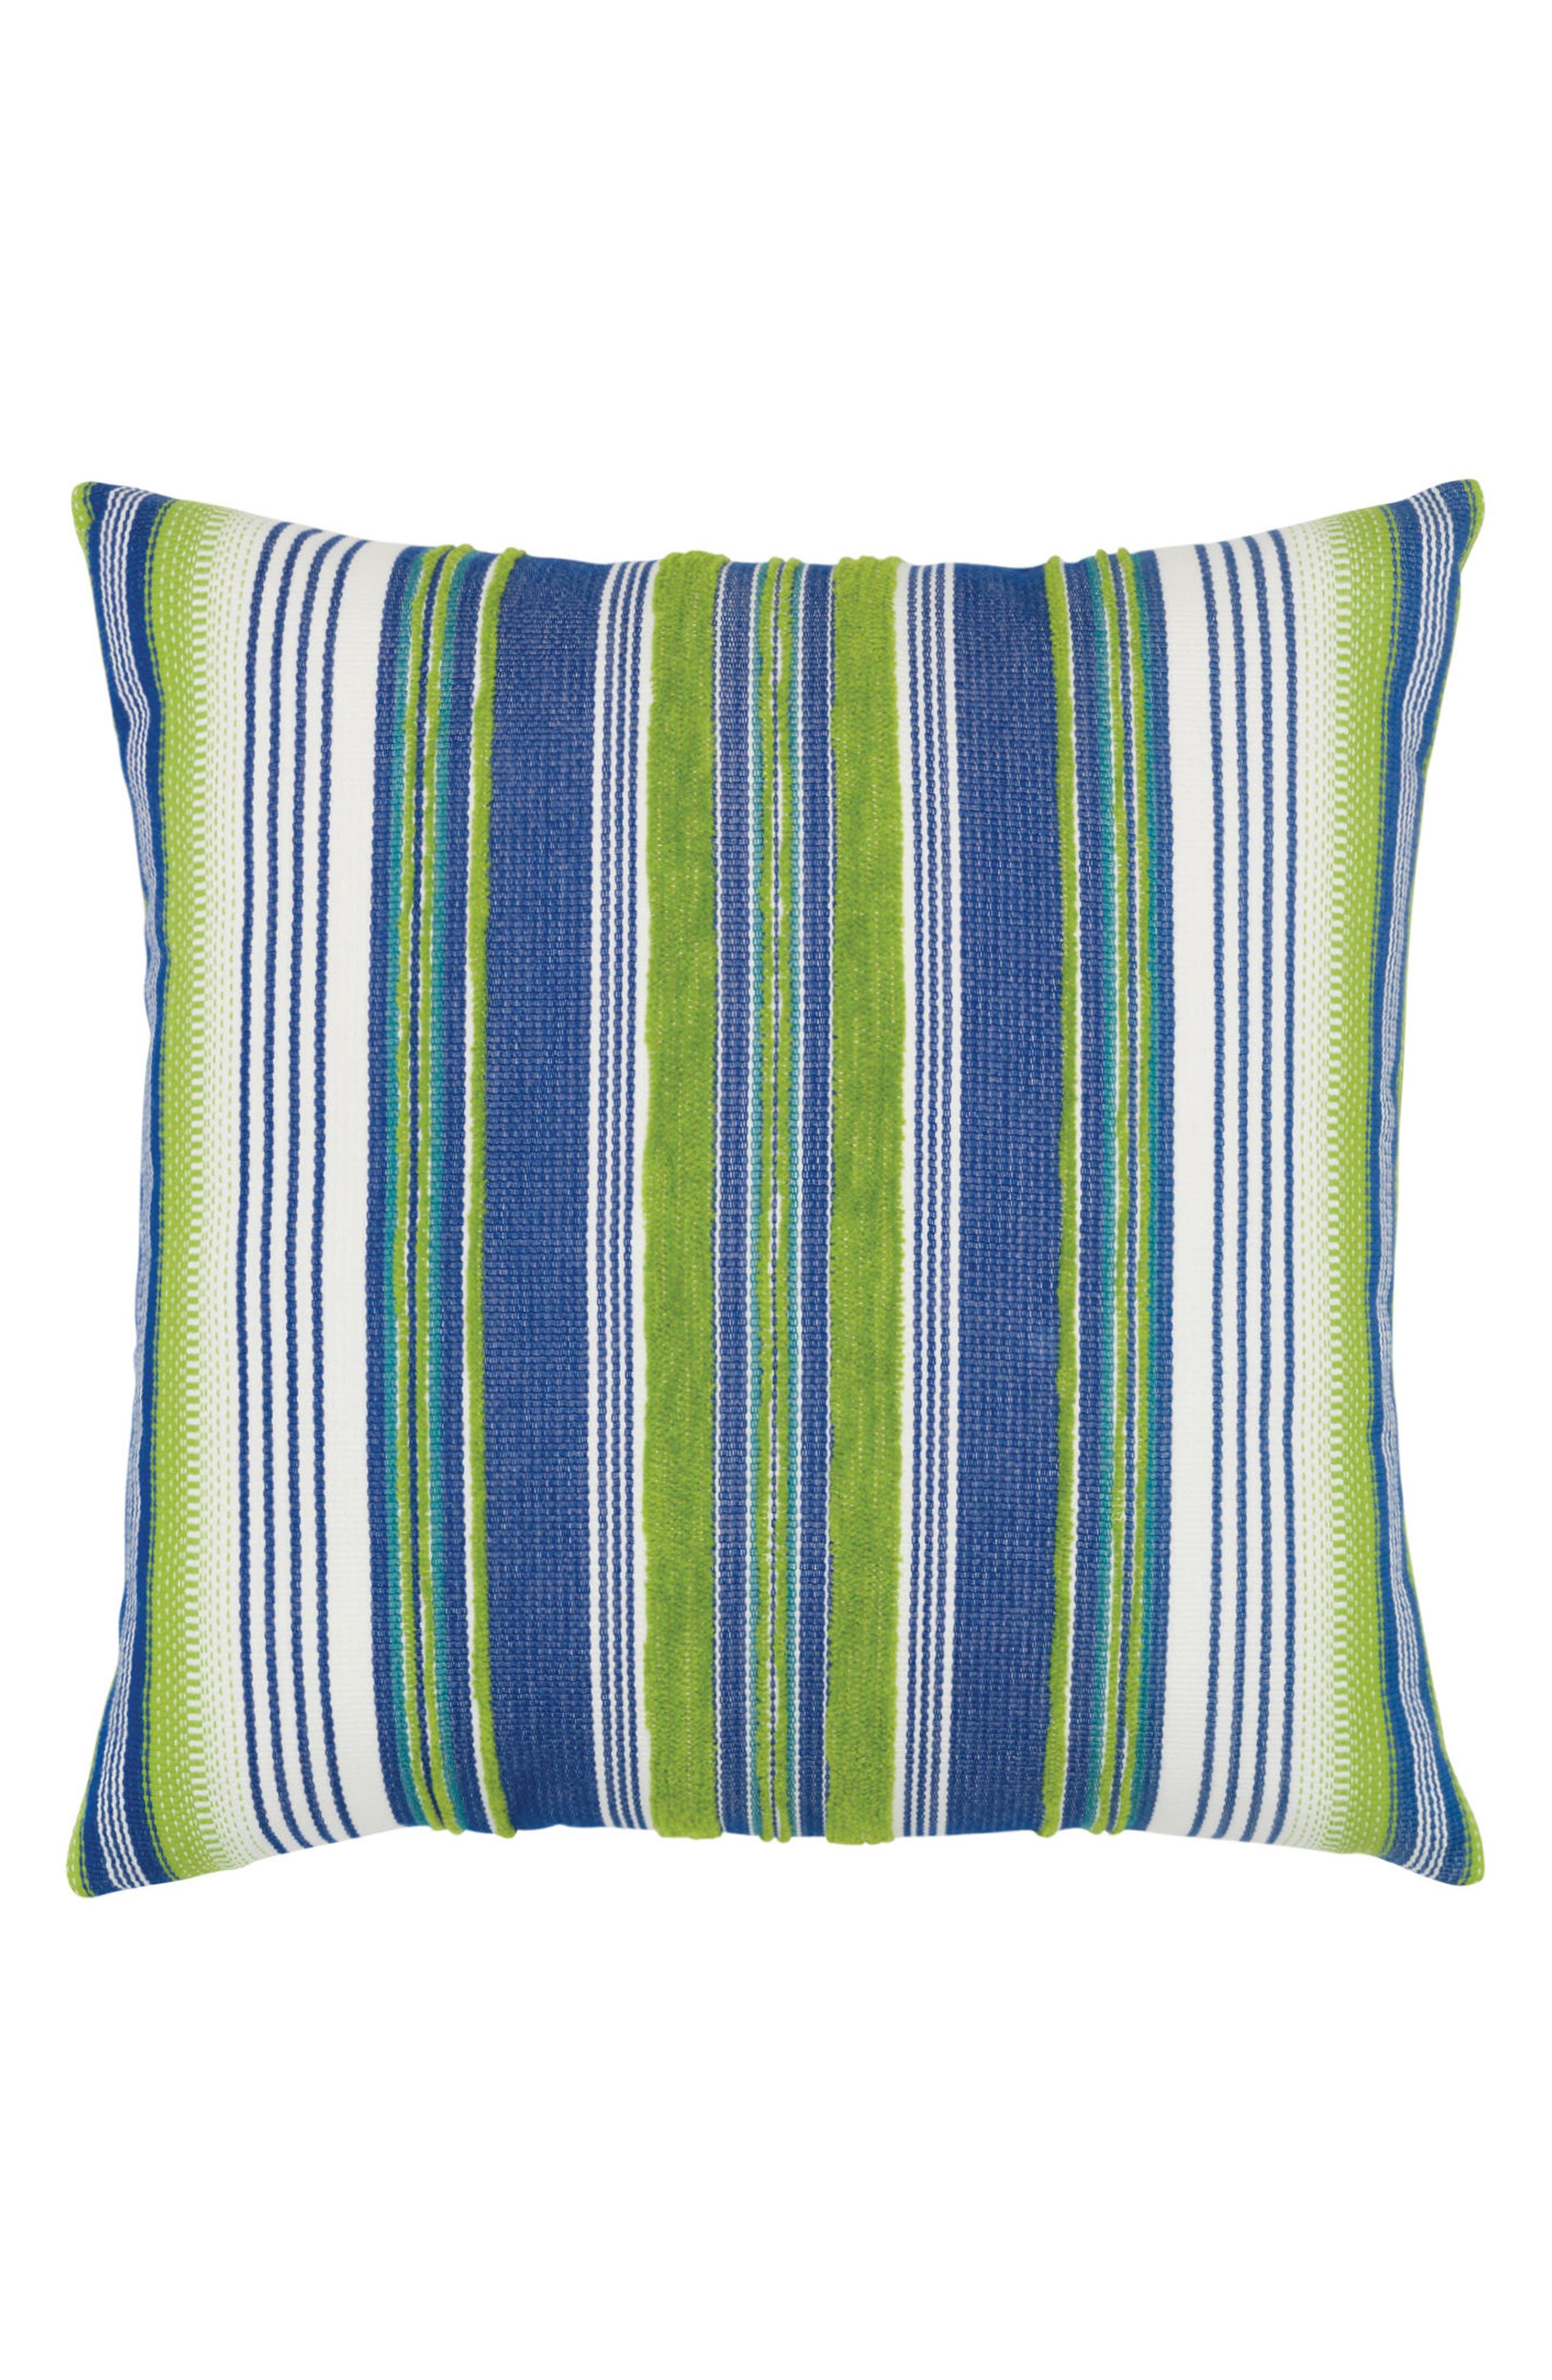 ELAINE SMITH Deep Sea Stripe Indoor/Outdoor Accent Pillow, Main, color, 400